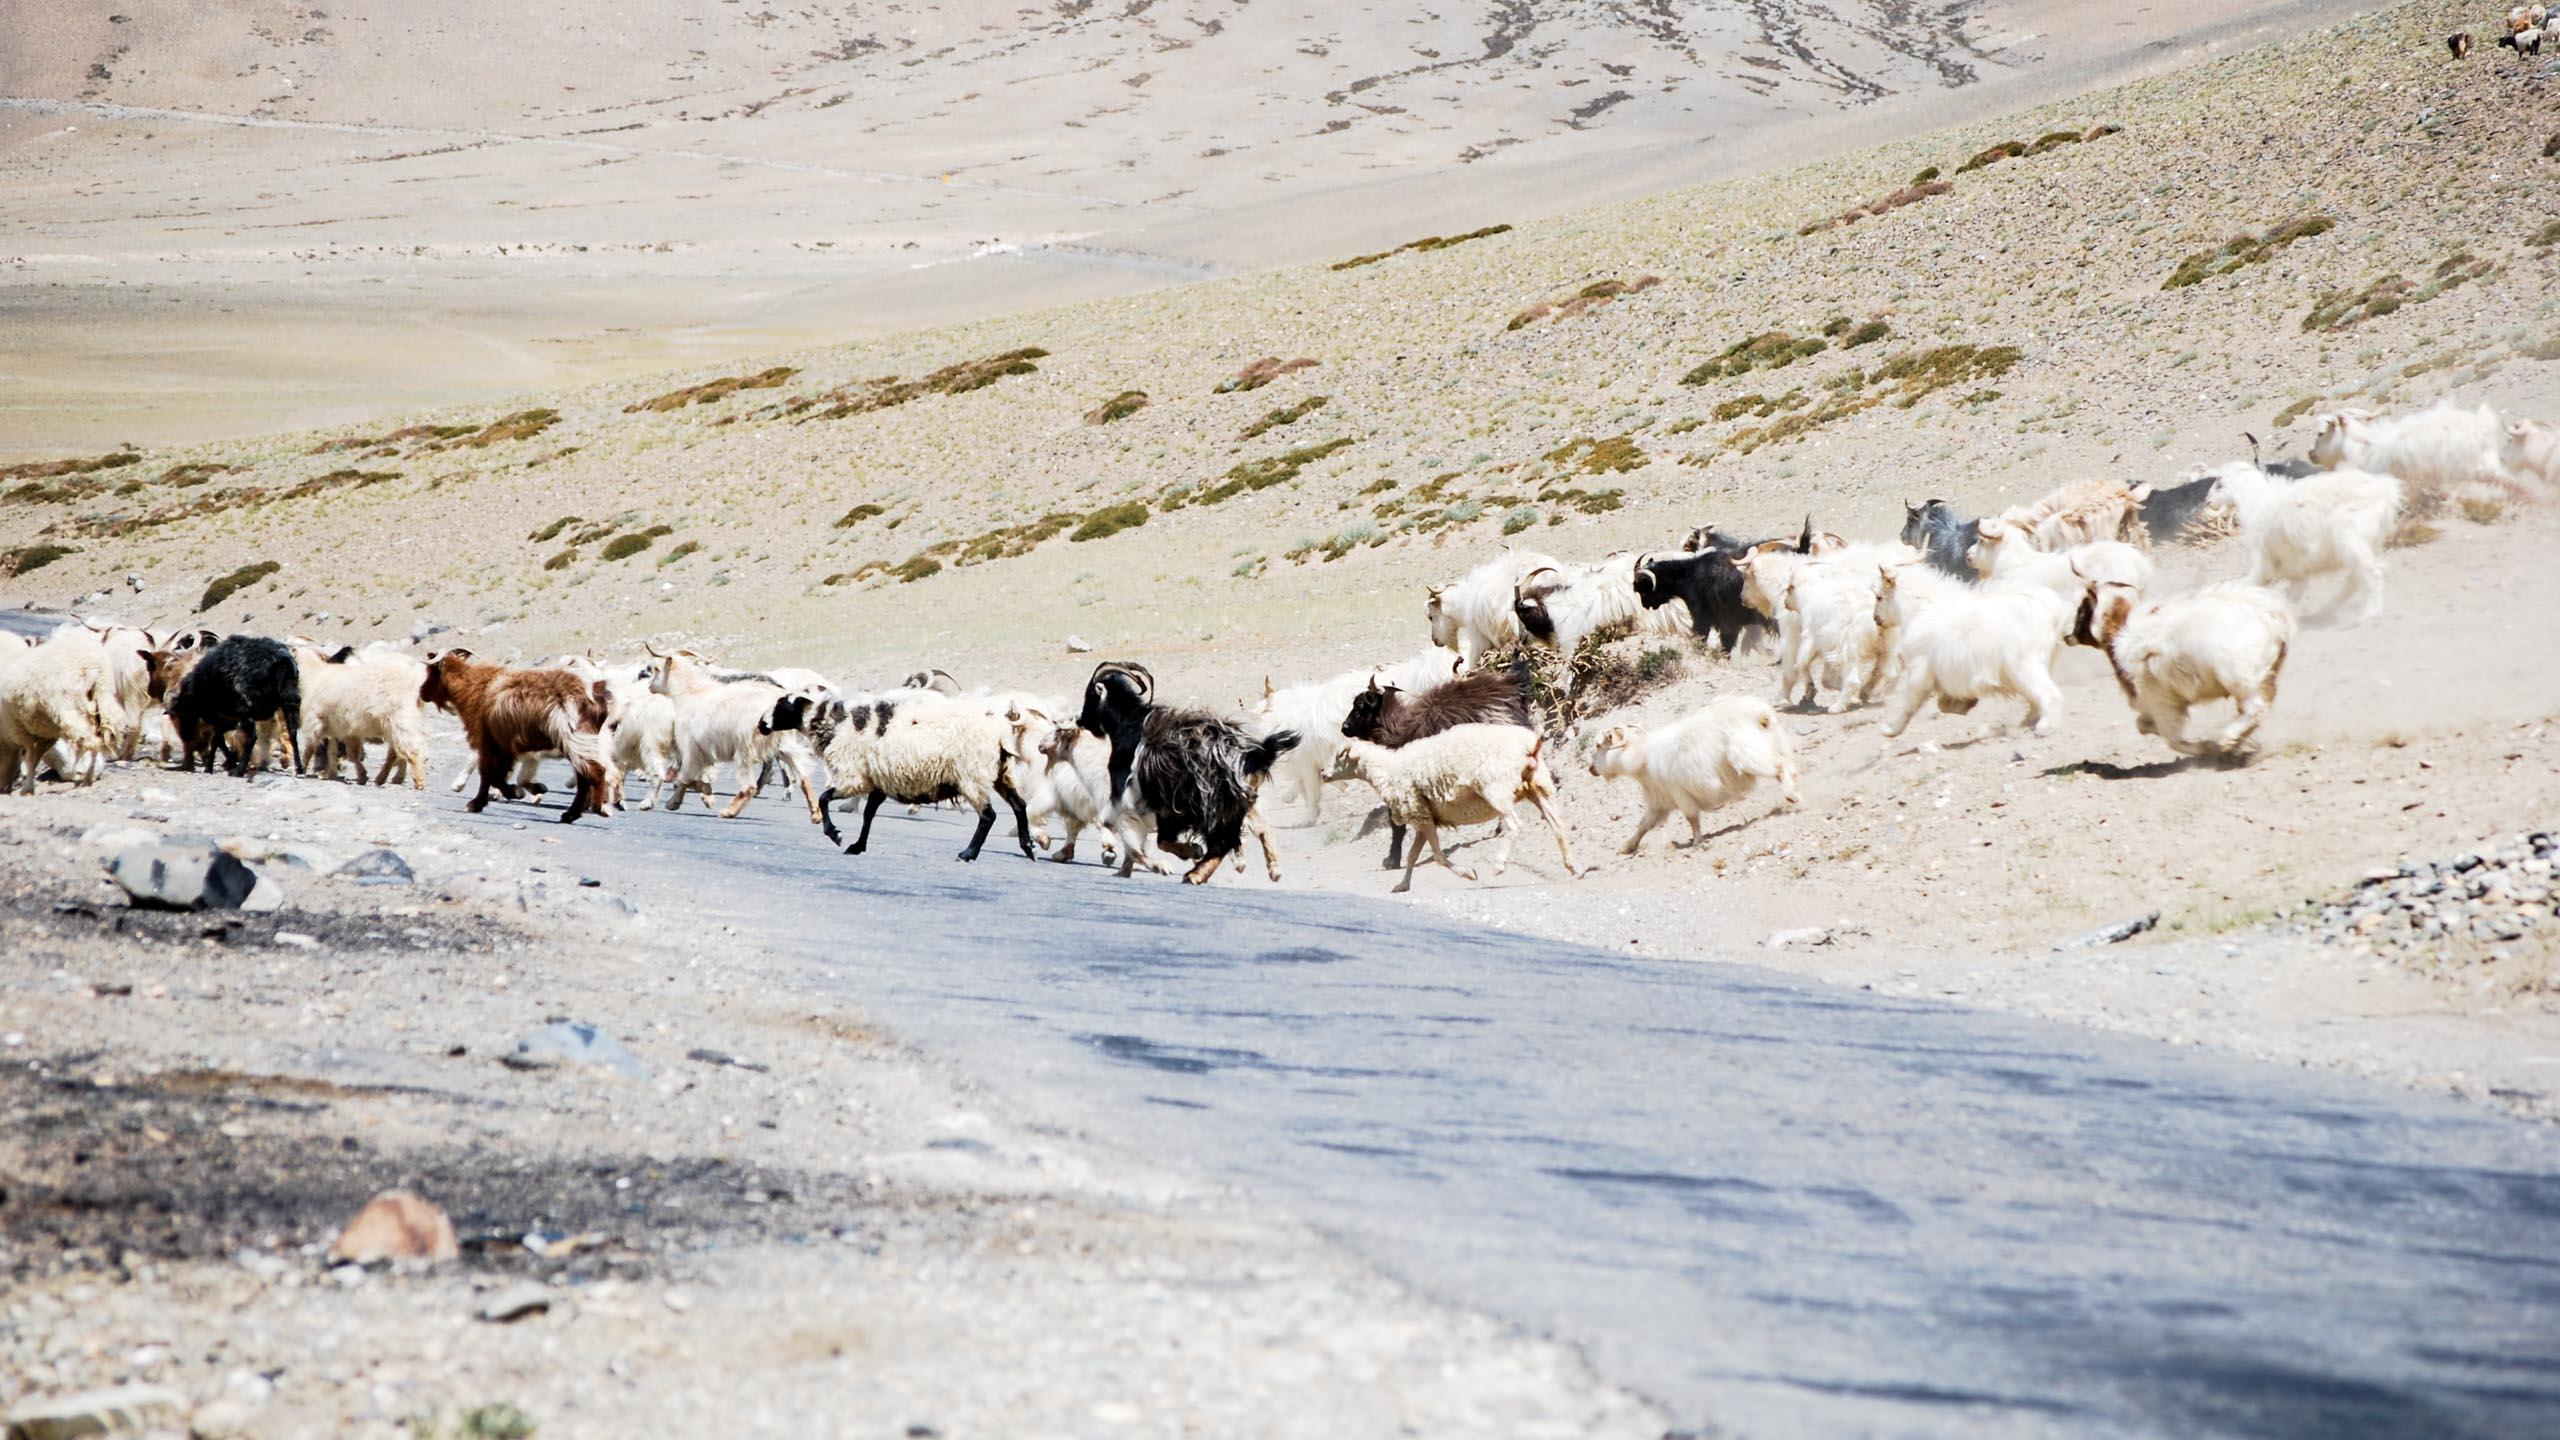 Herd of animals cross the road in Ladakh